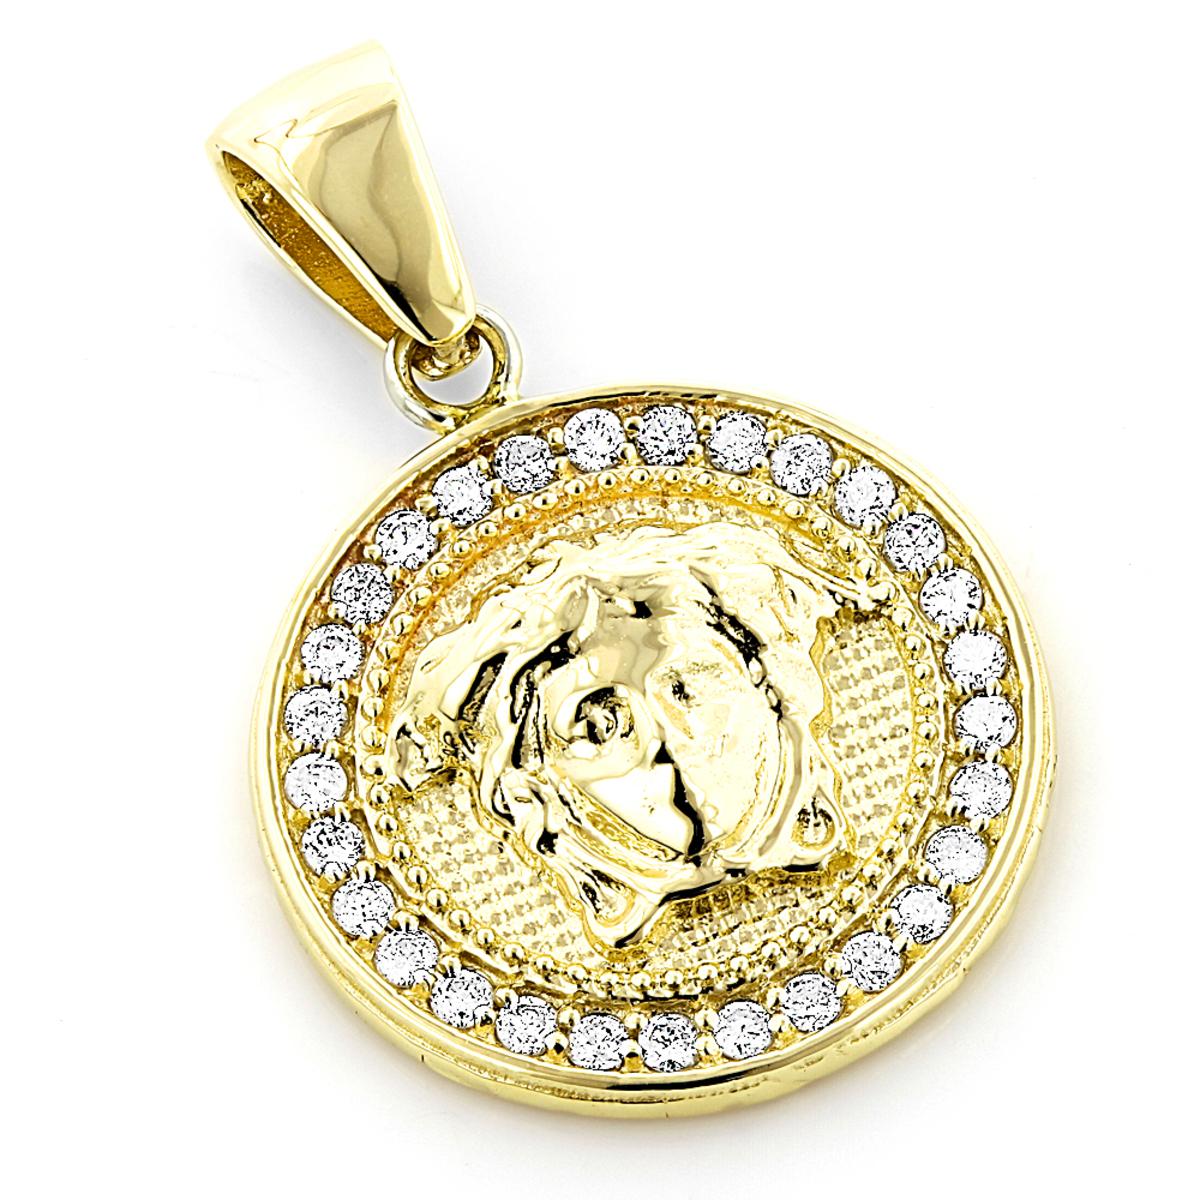 Fedex Golden Ring Hours